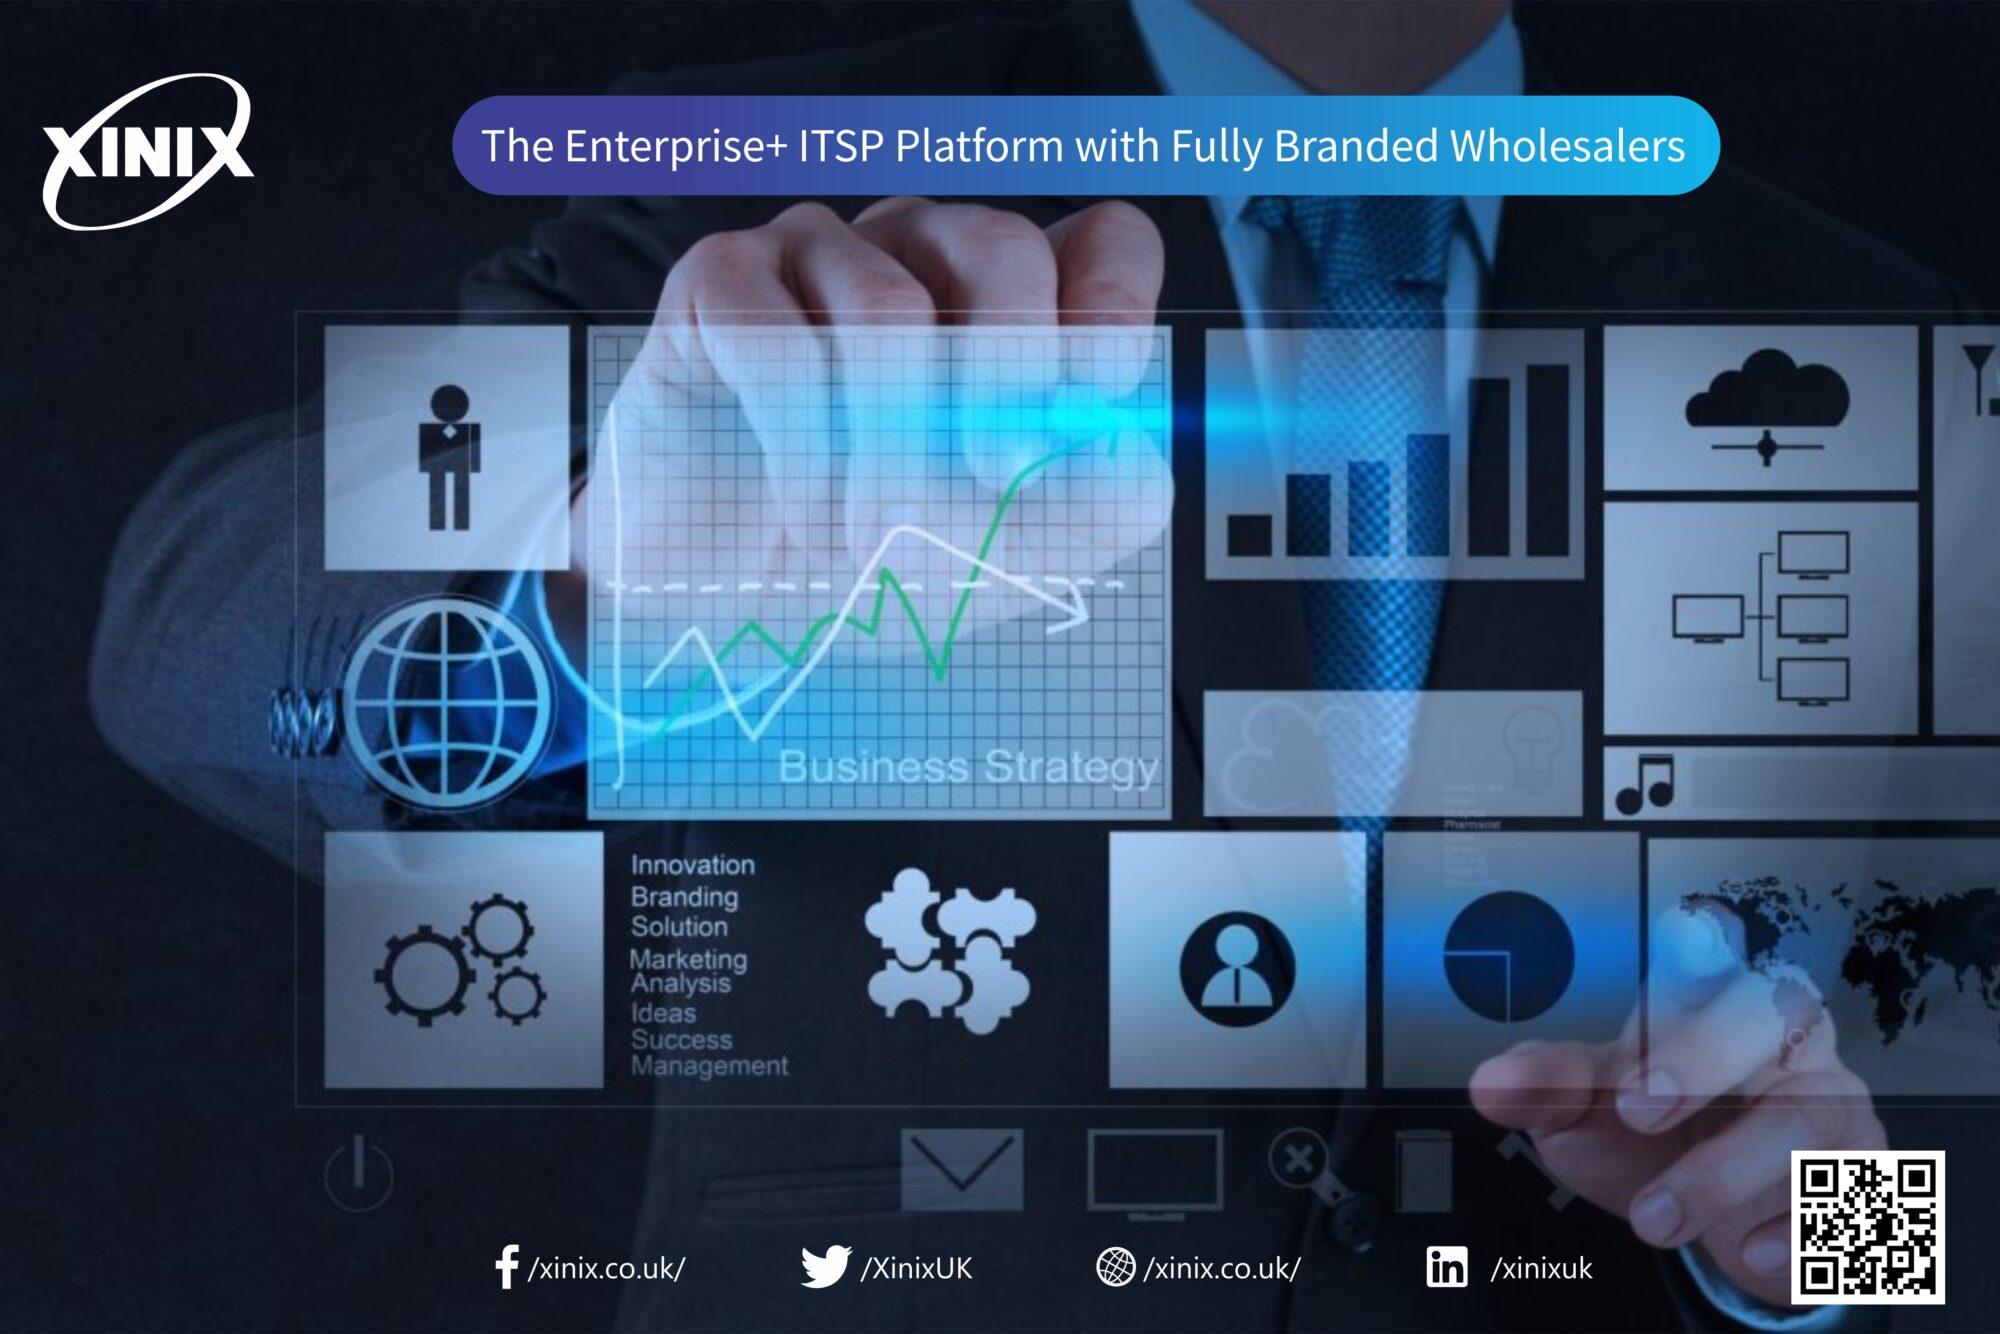 The Enterprise+ ITSP Platform with Fully Branded Wholesalers